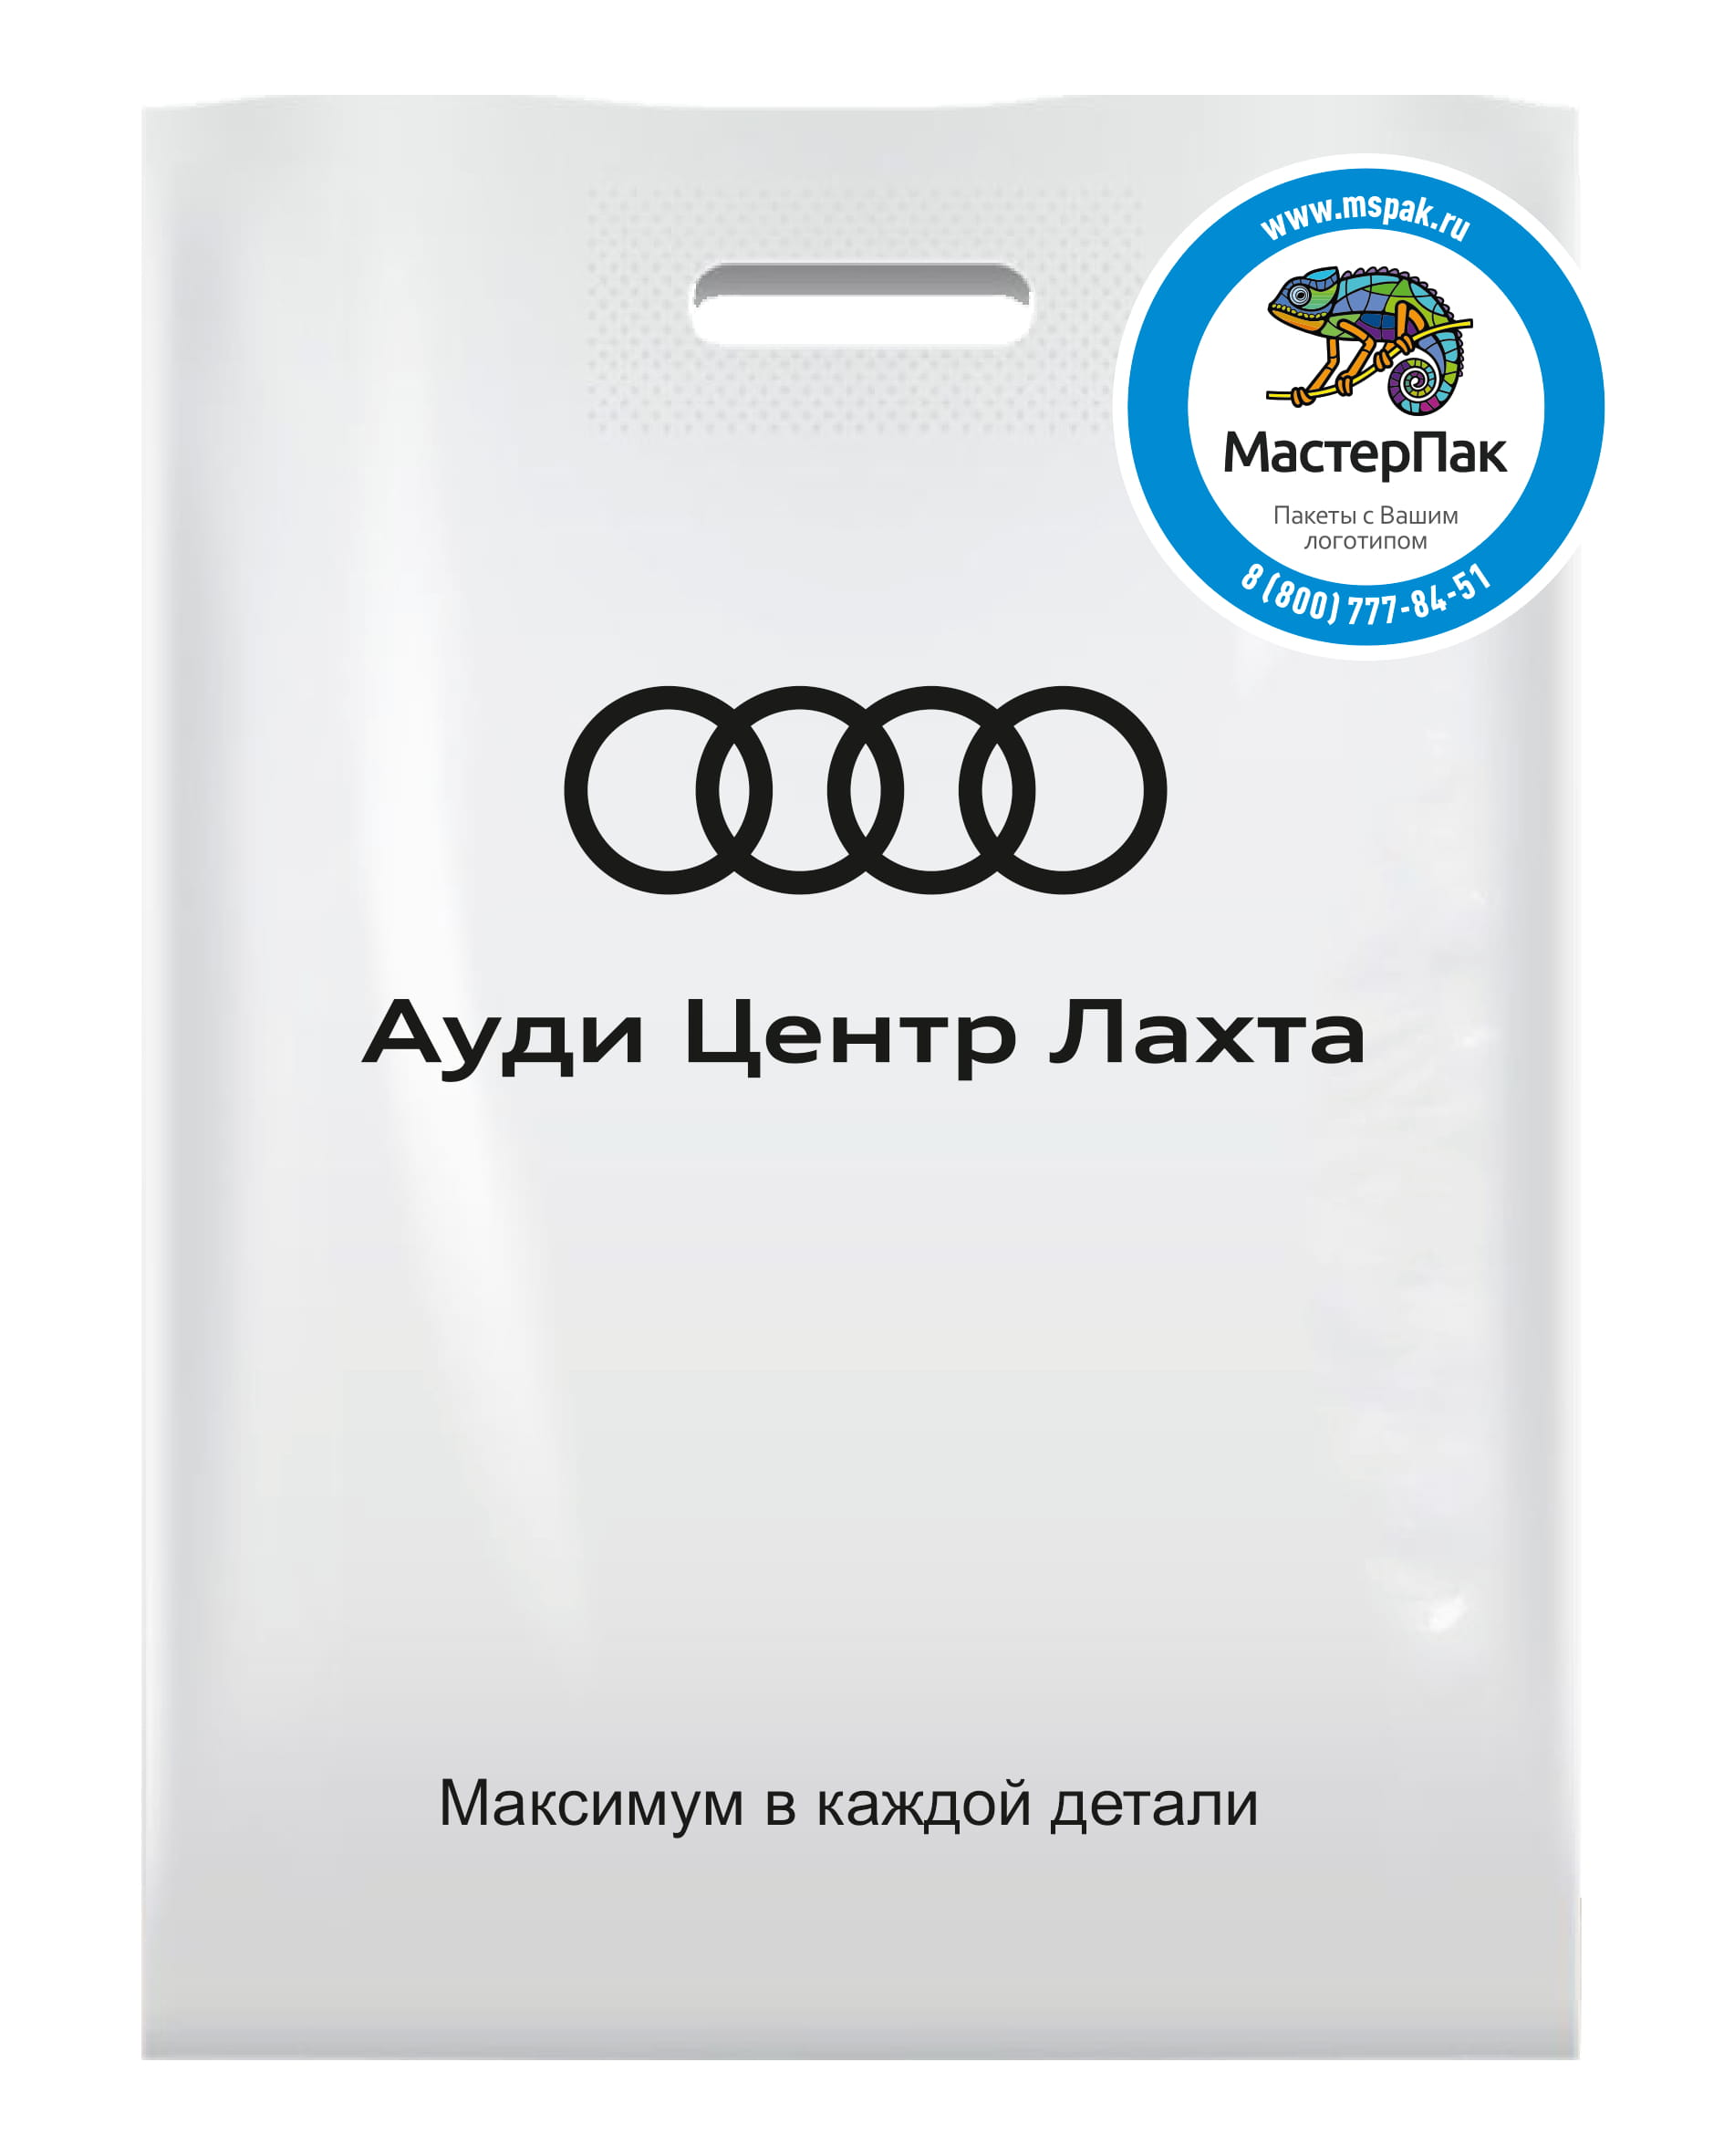 Пакет ПВД с логотипом Ауди центр Лахта, 70 мкм, 30*40, белый